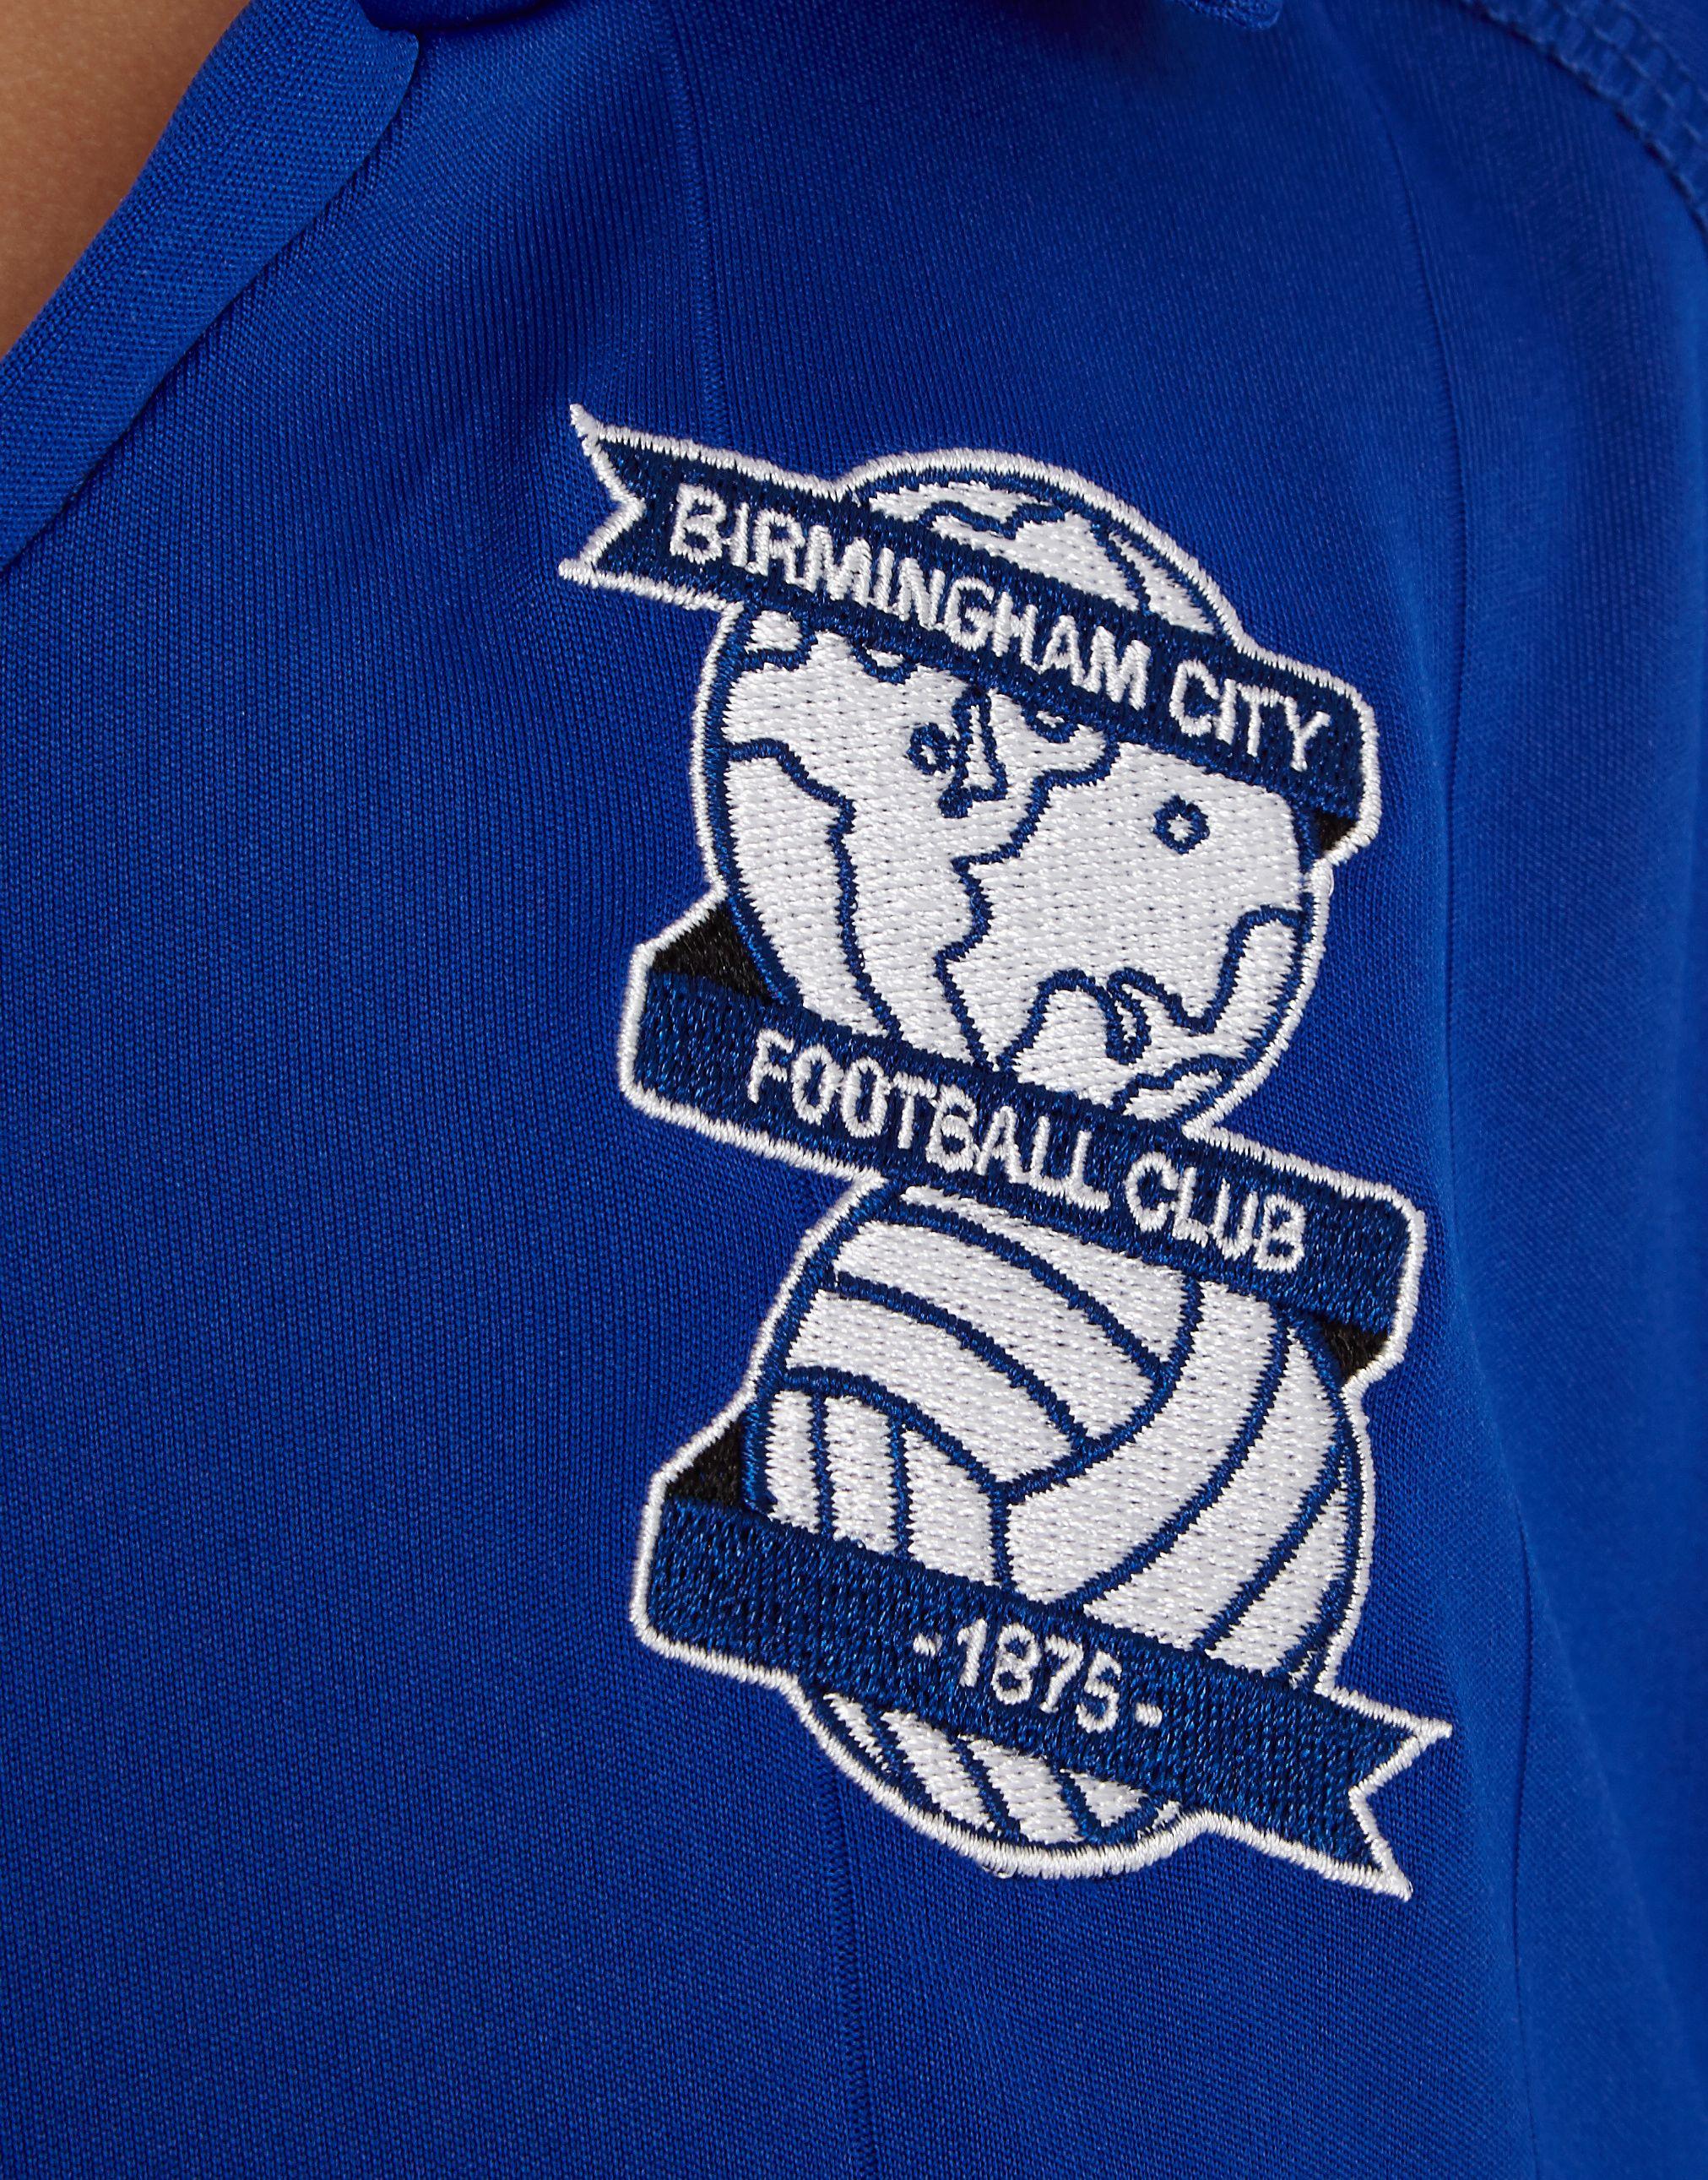 Carbrini Birmingham City FC 2014 Home Kit Infant